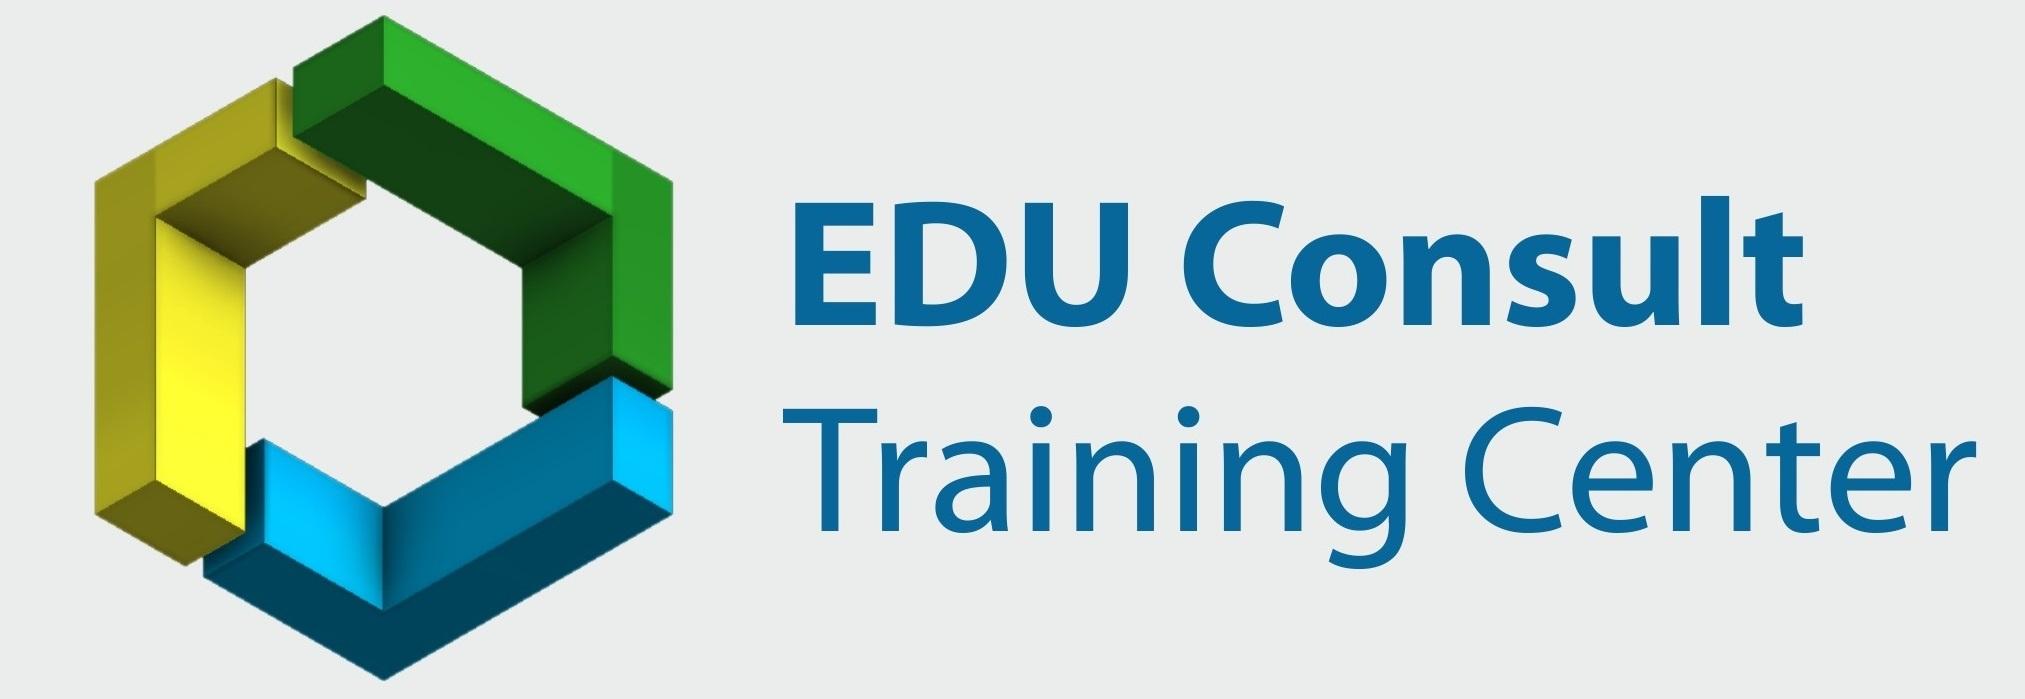 Logo EDU Consult - Centrum Usług Szkoleniowych